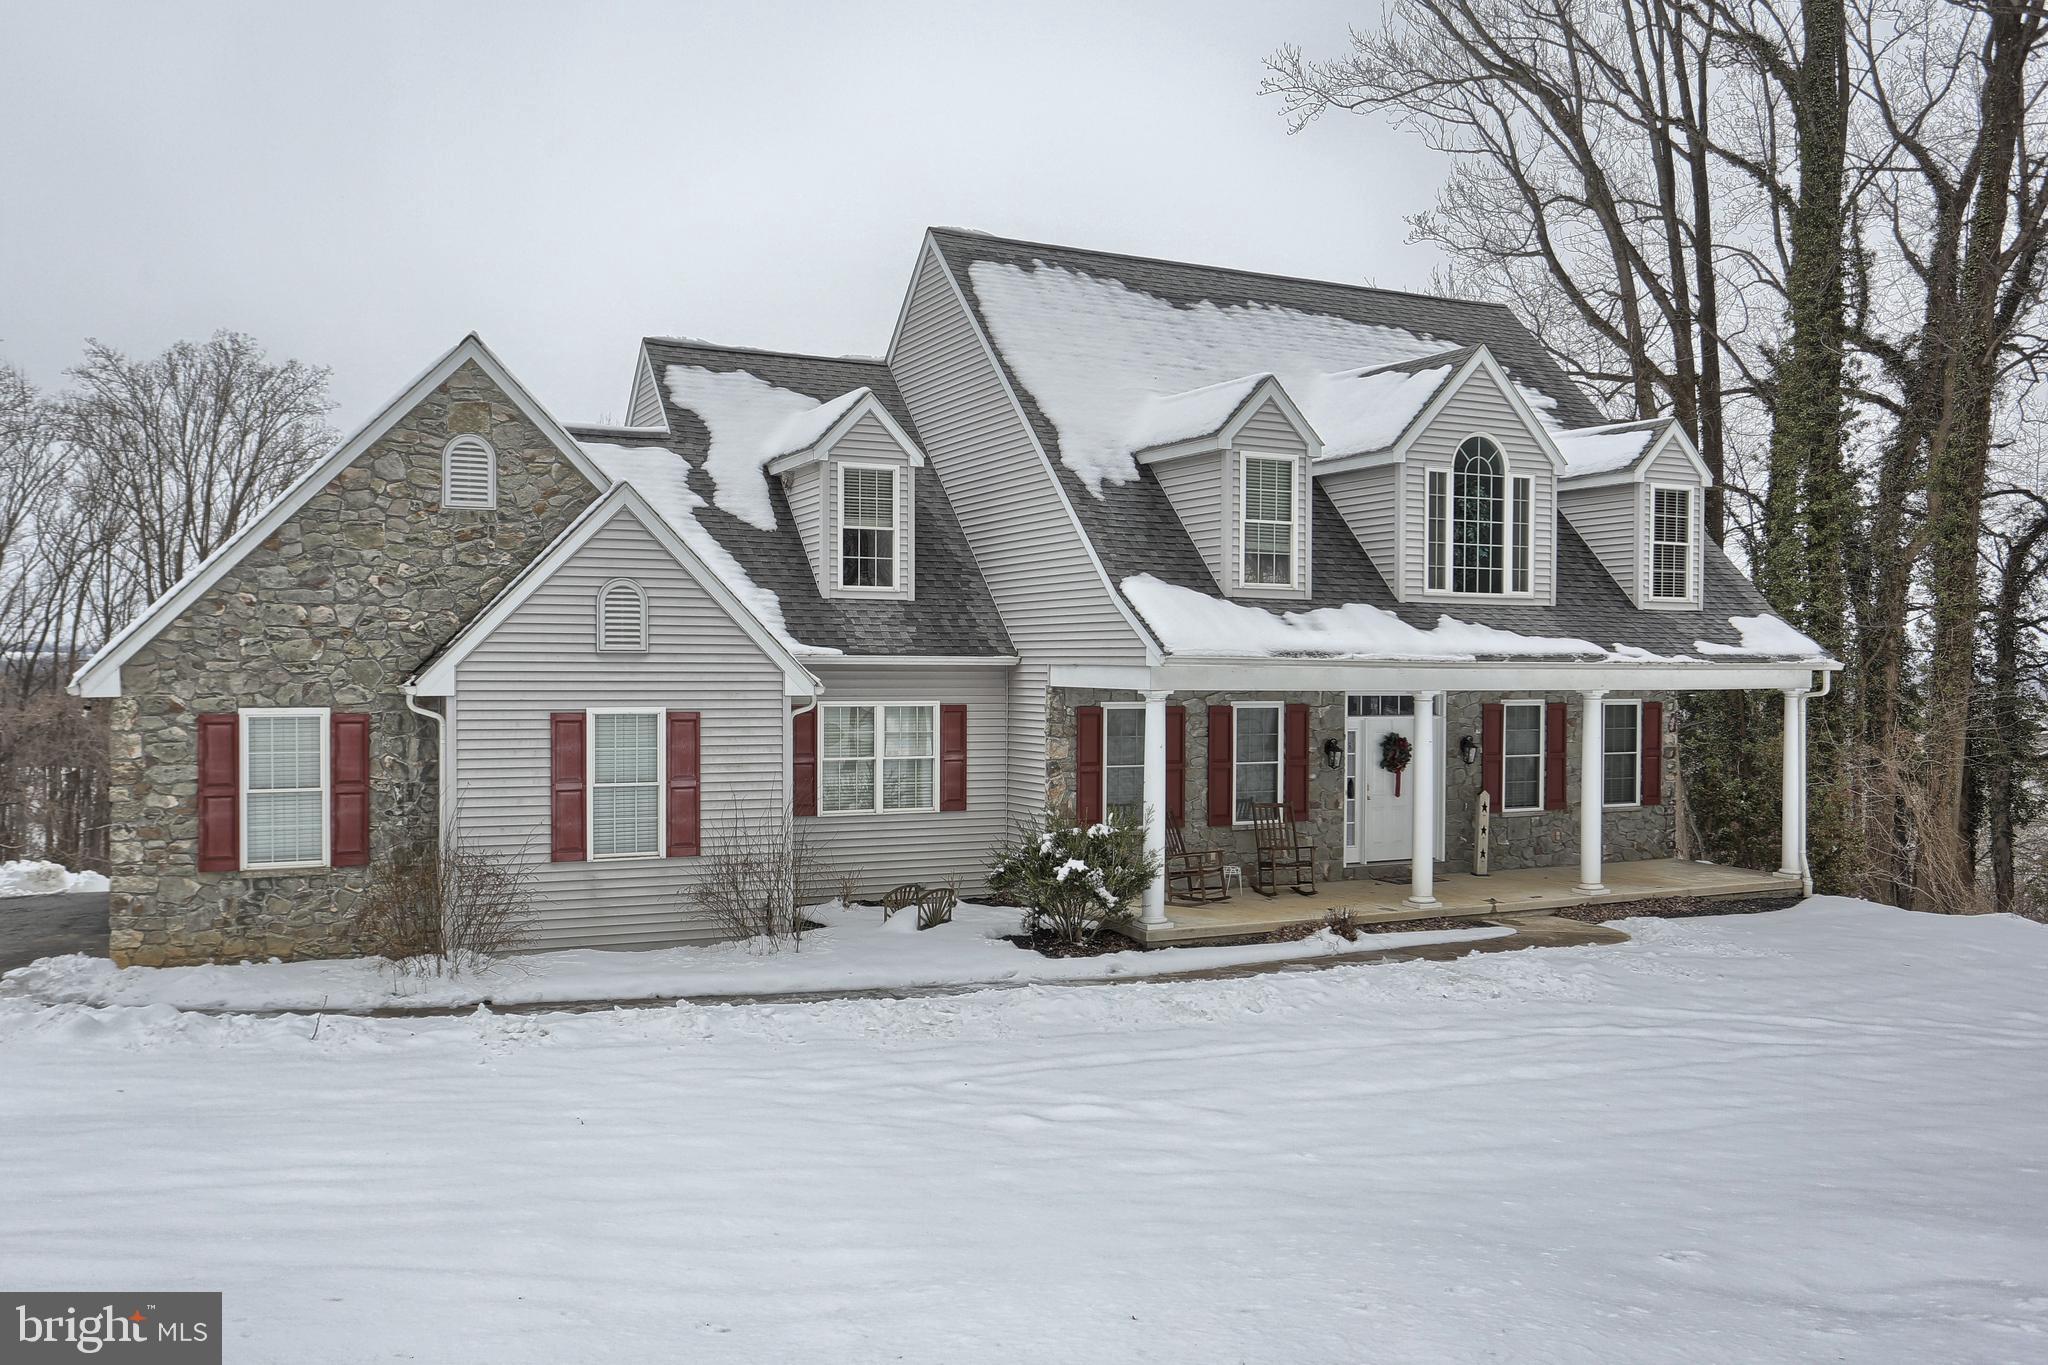 113 MOUNT HOPE SCHOOL ROAD, WILLOW STREET, PA 17584